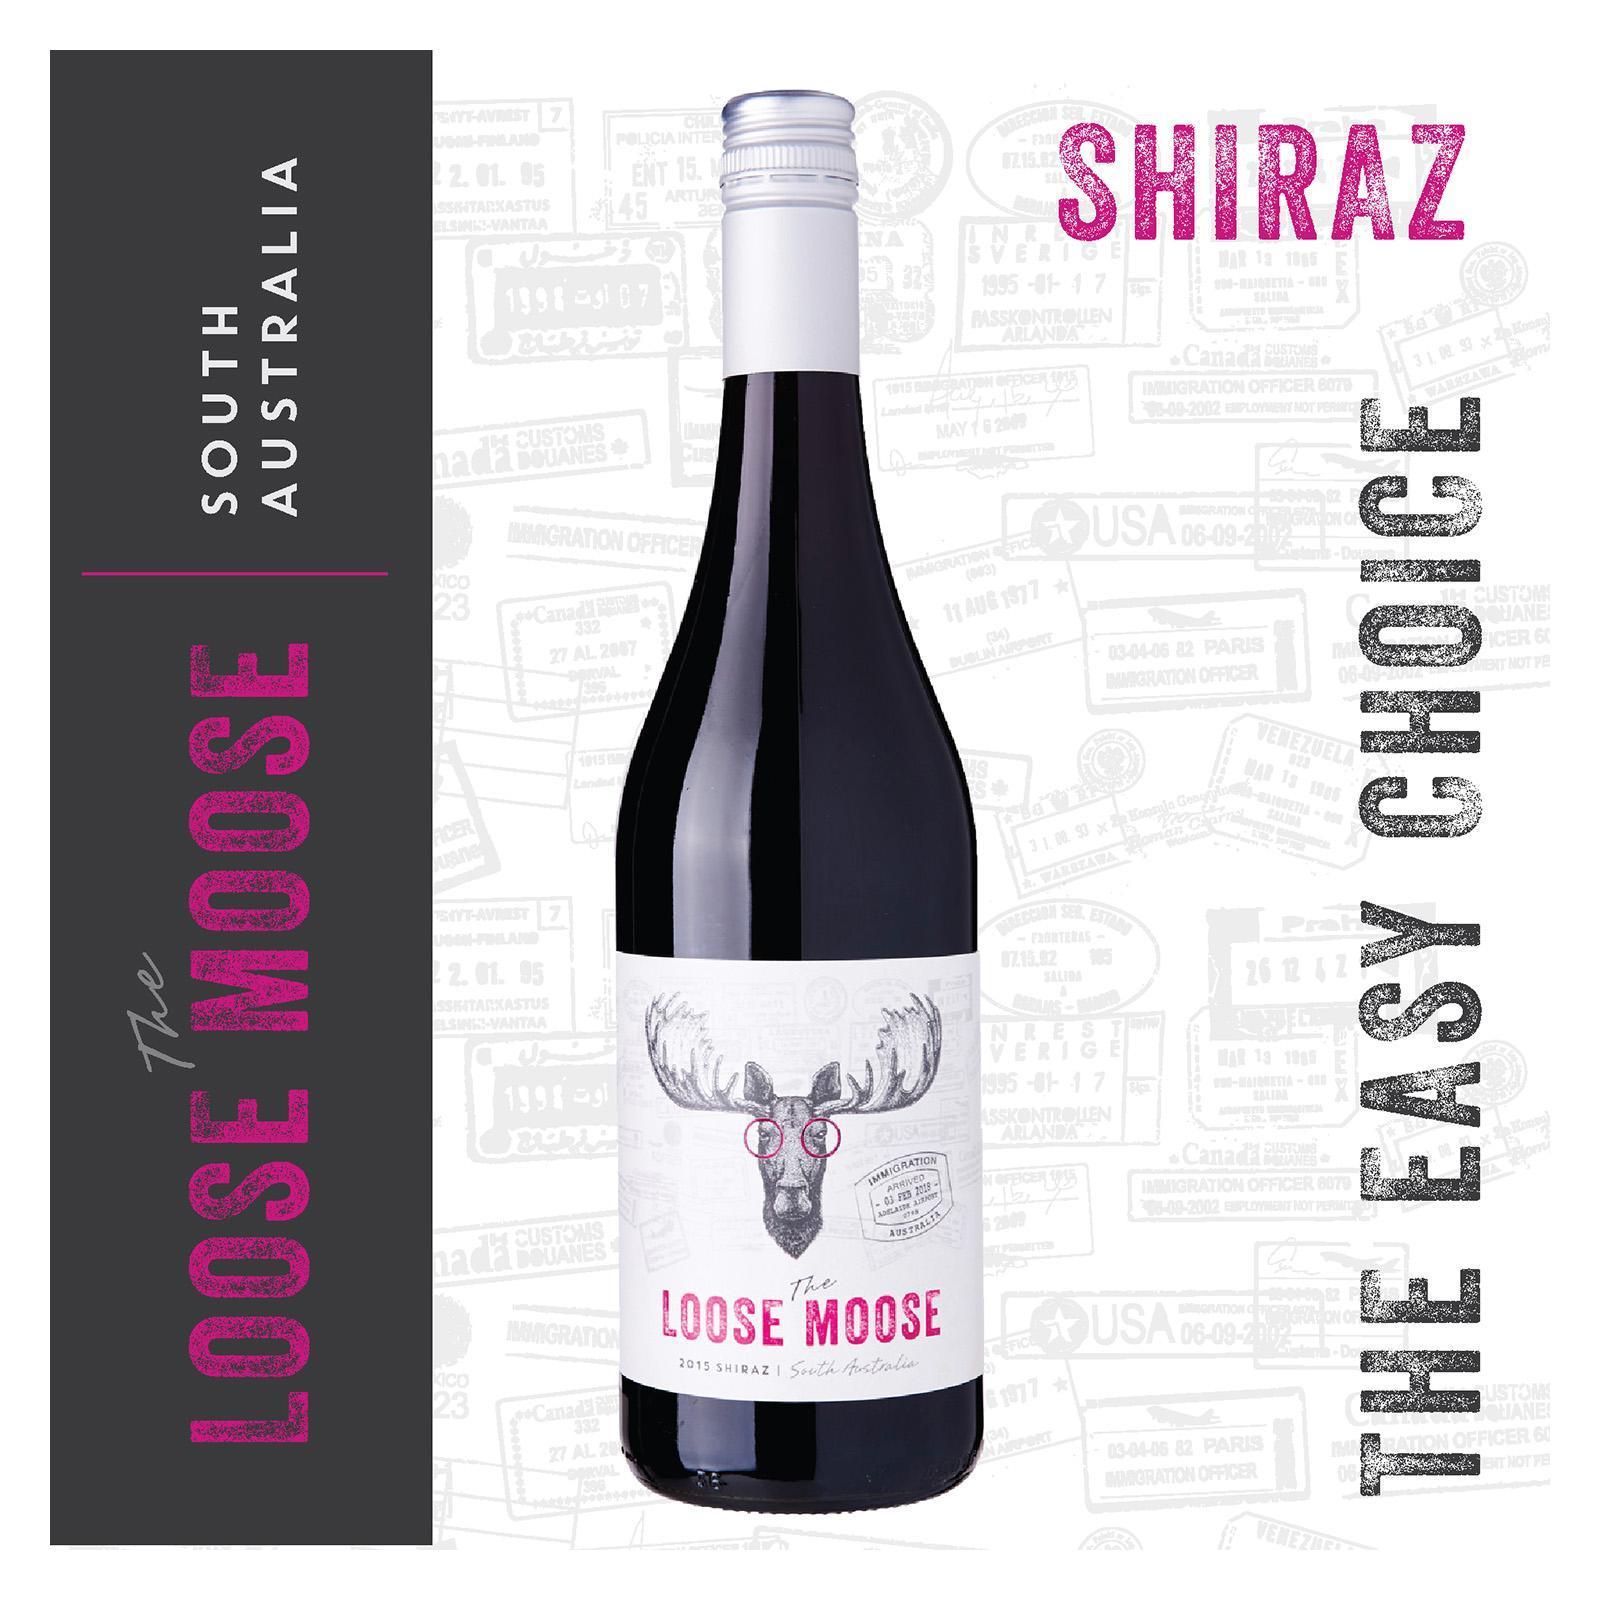 The Loose Moose South Australia Shiraz Red Wine